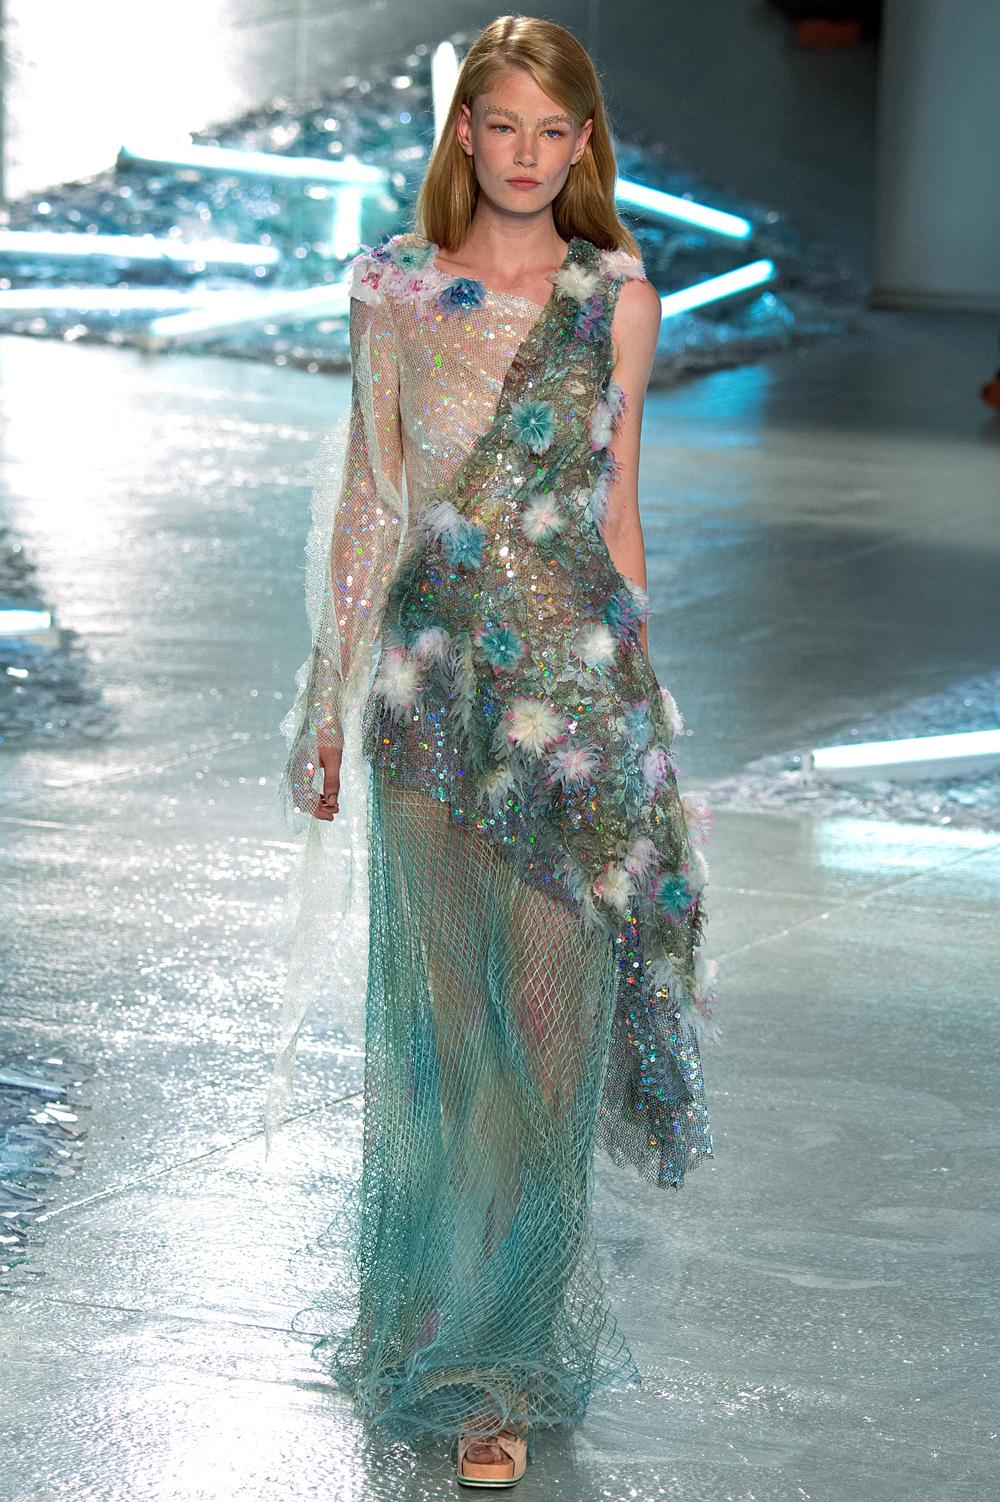 Ocean fashion dress up 21